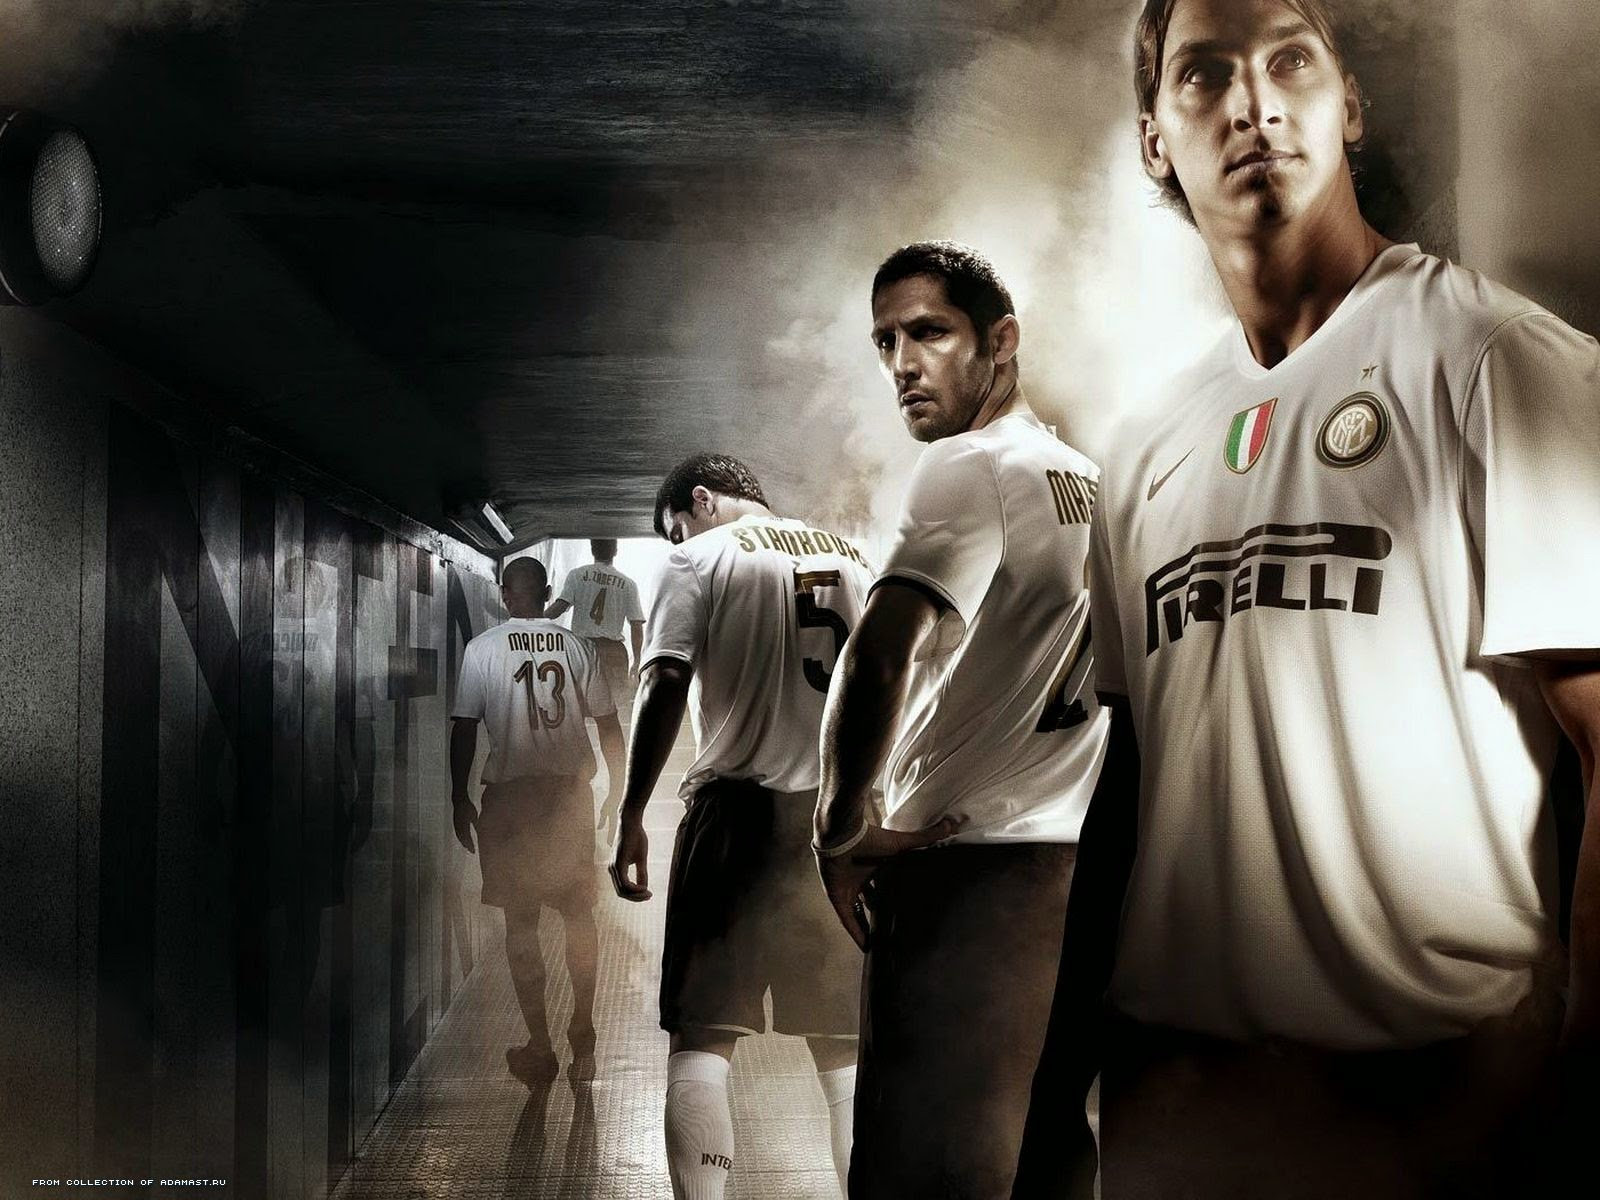 Download Gambar Inter Milan Football Club Wallpaper